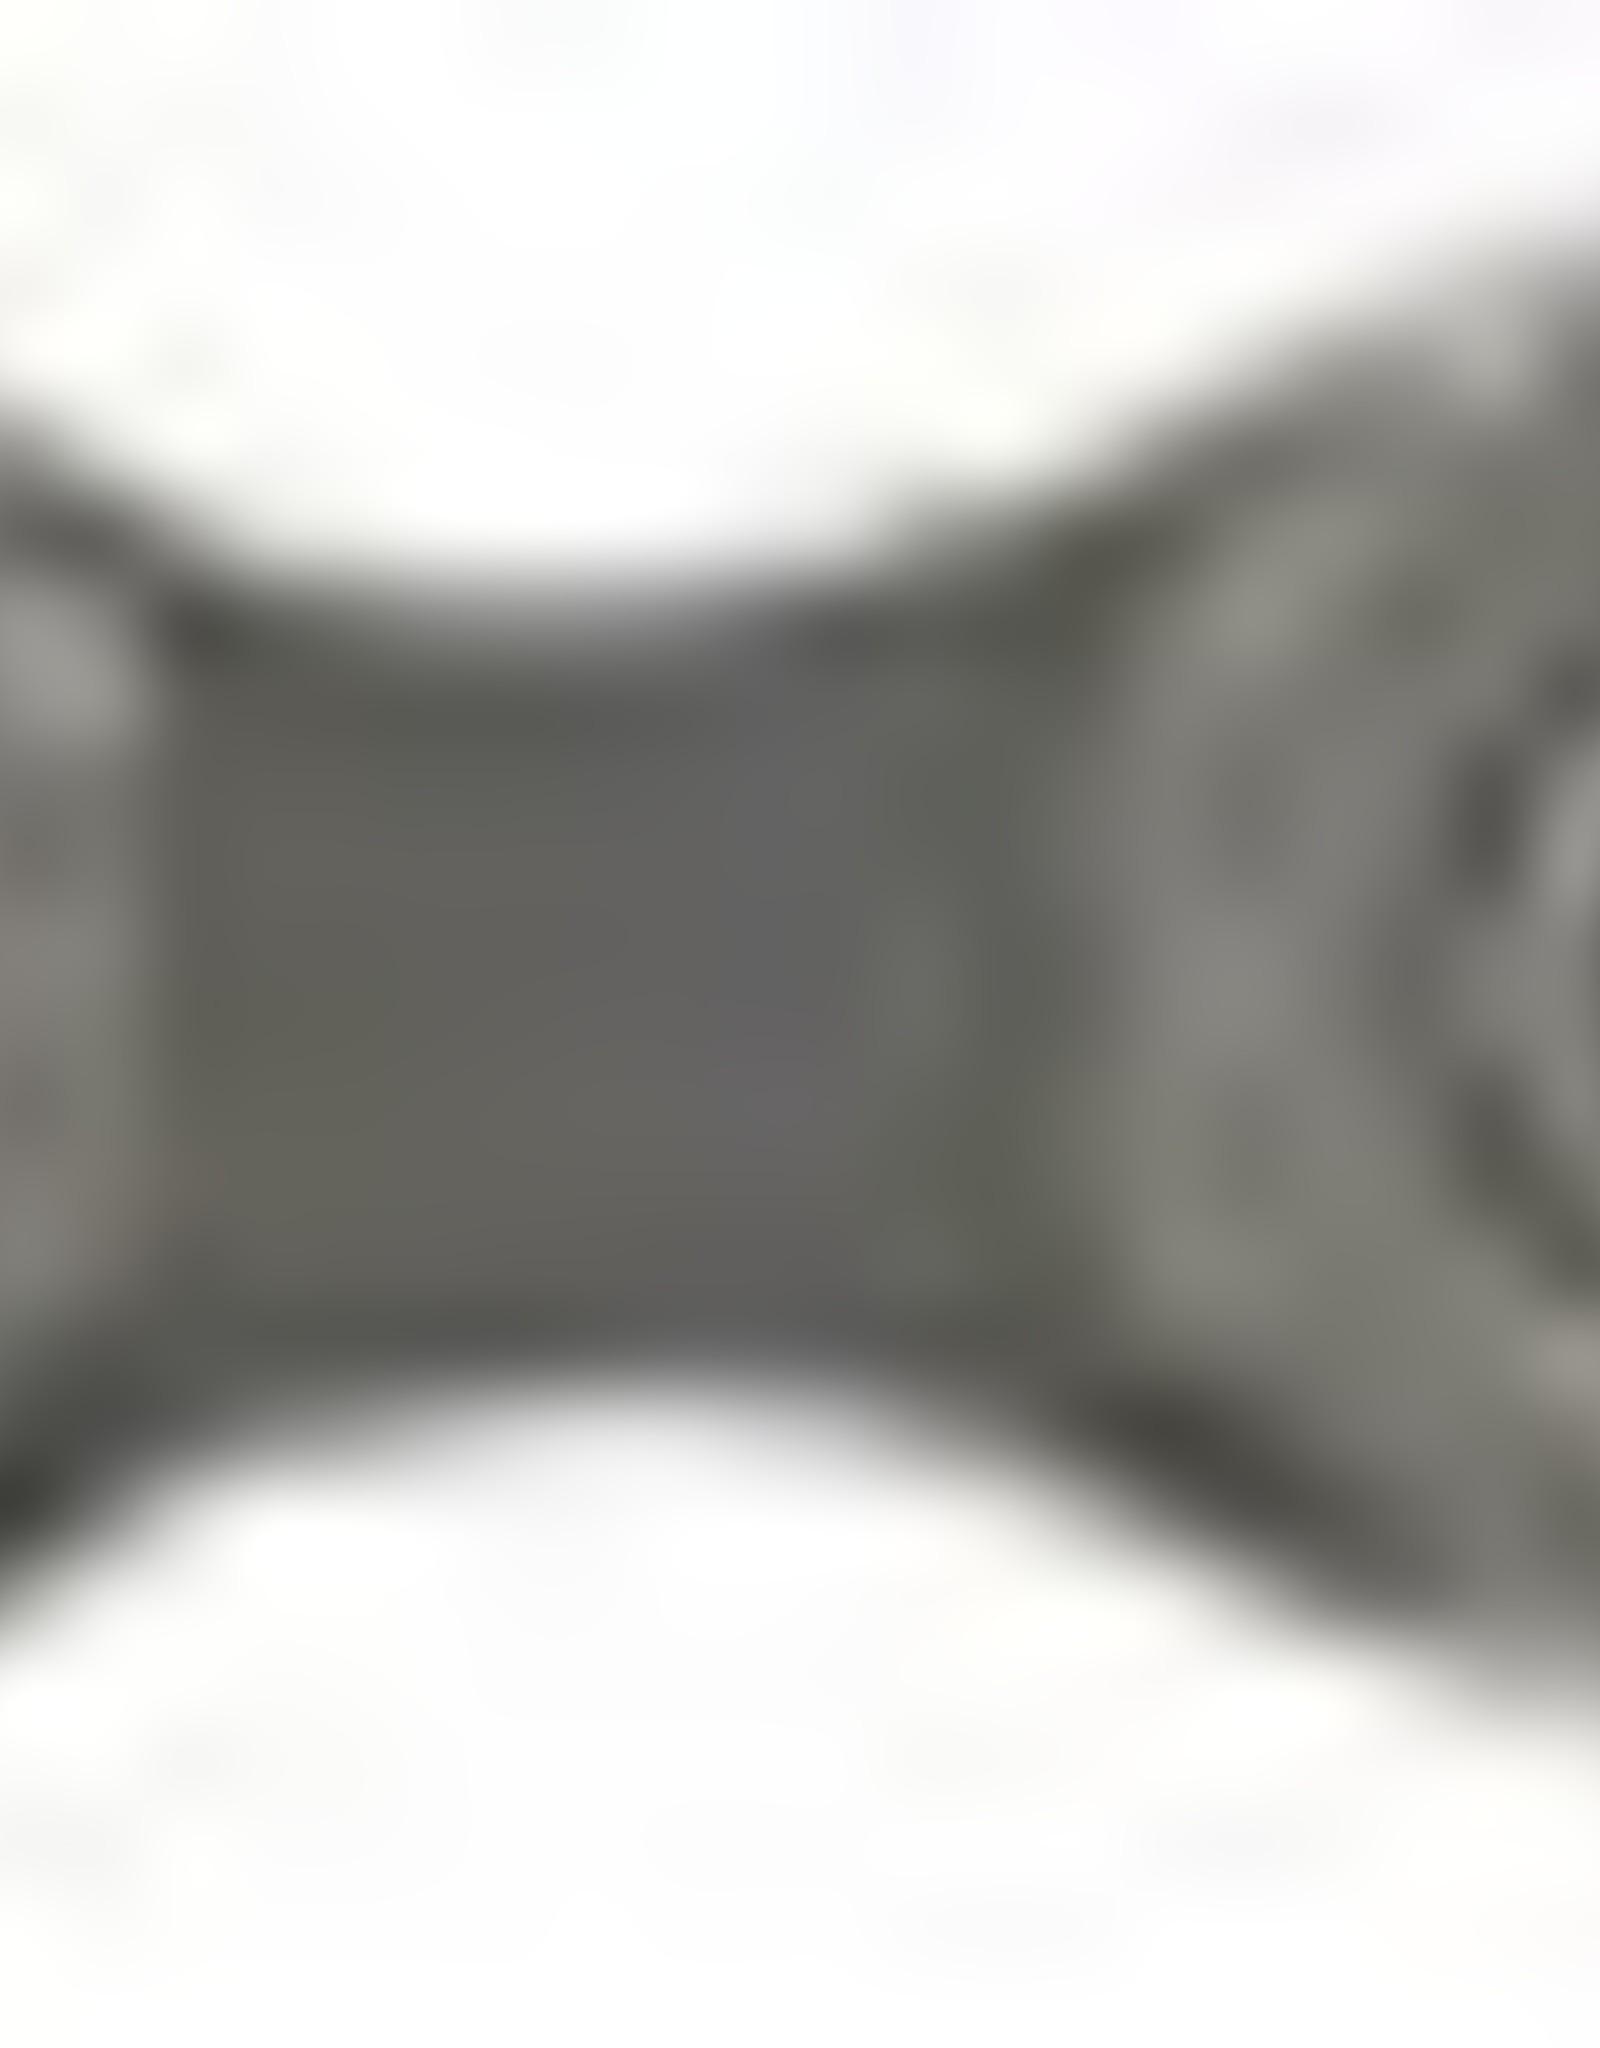 SRAM SRAM PC-1110 11S 114L Chain